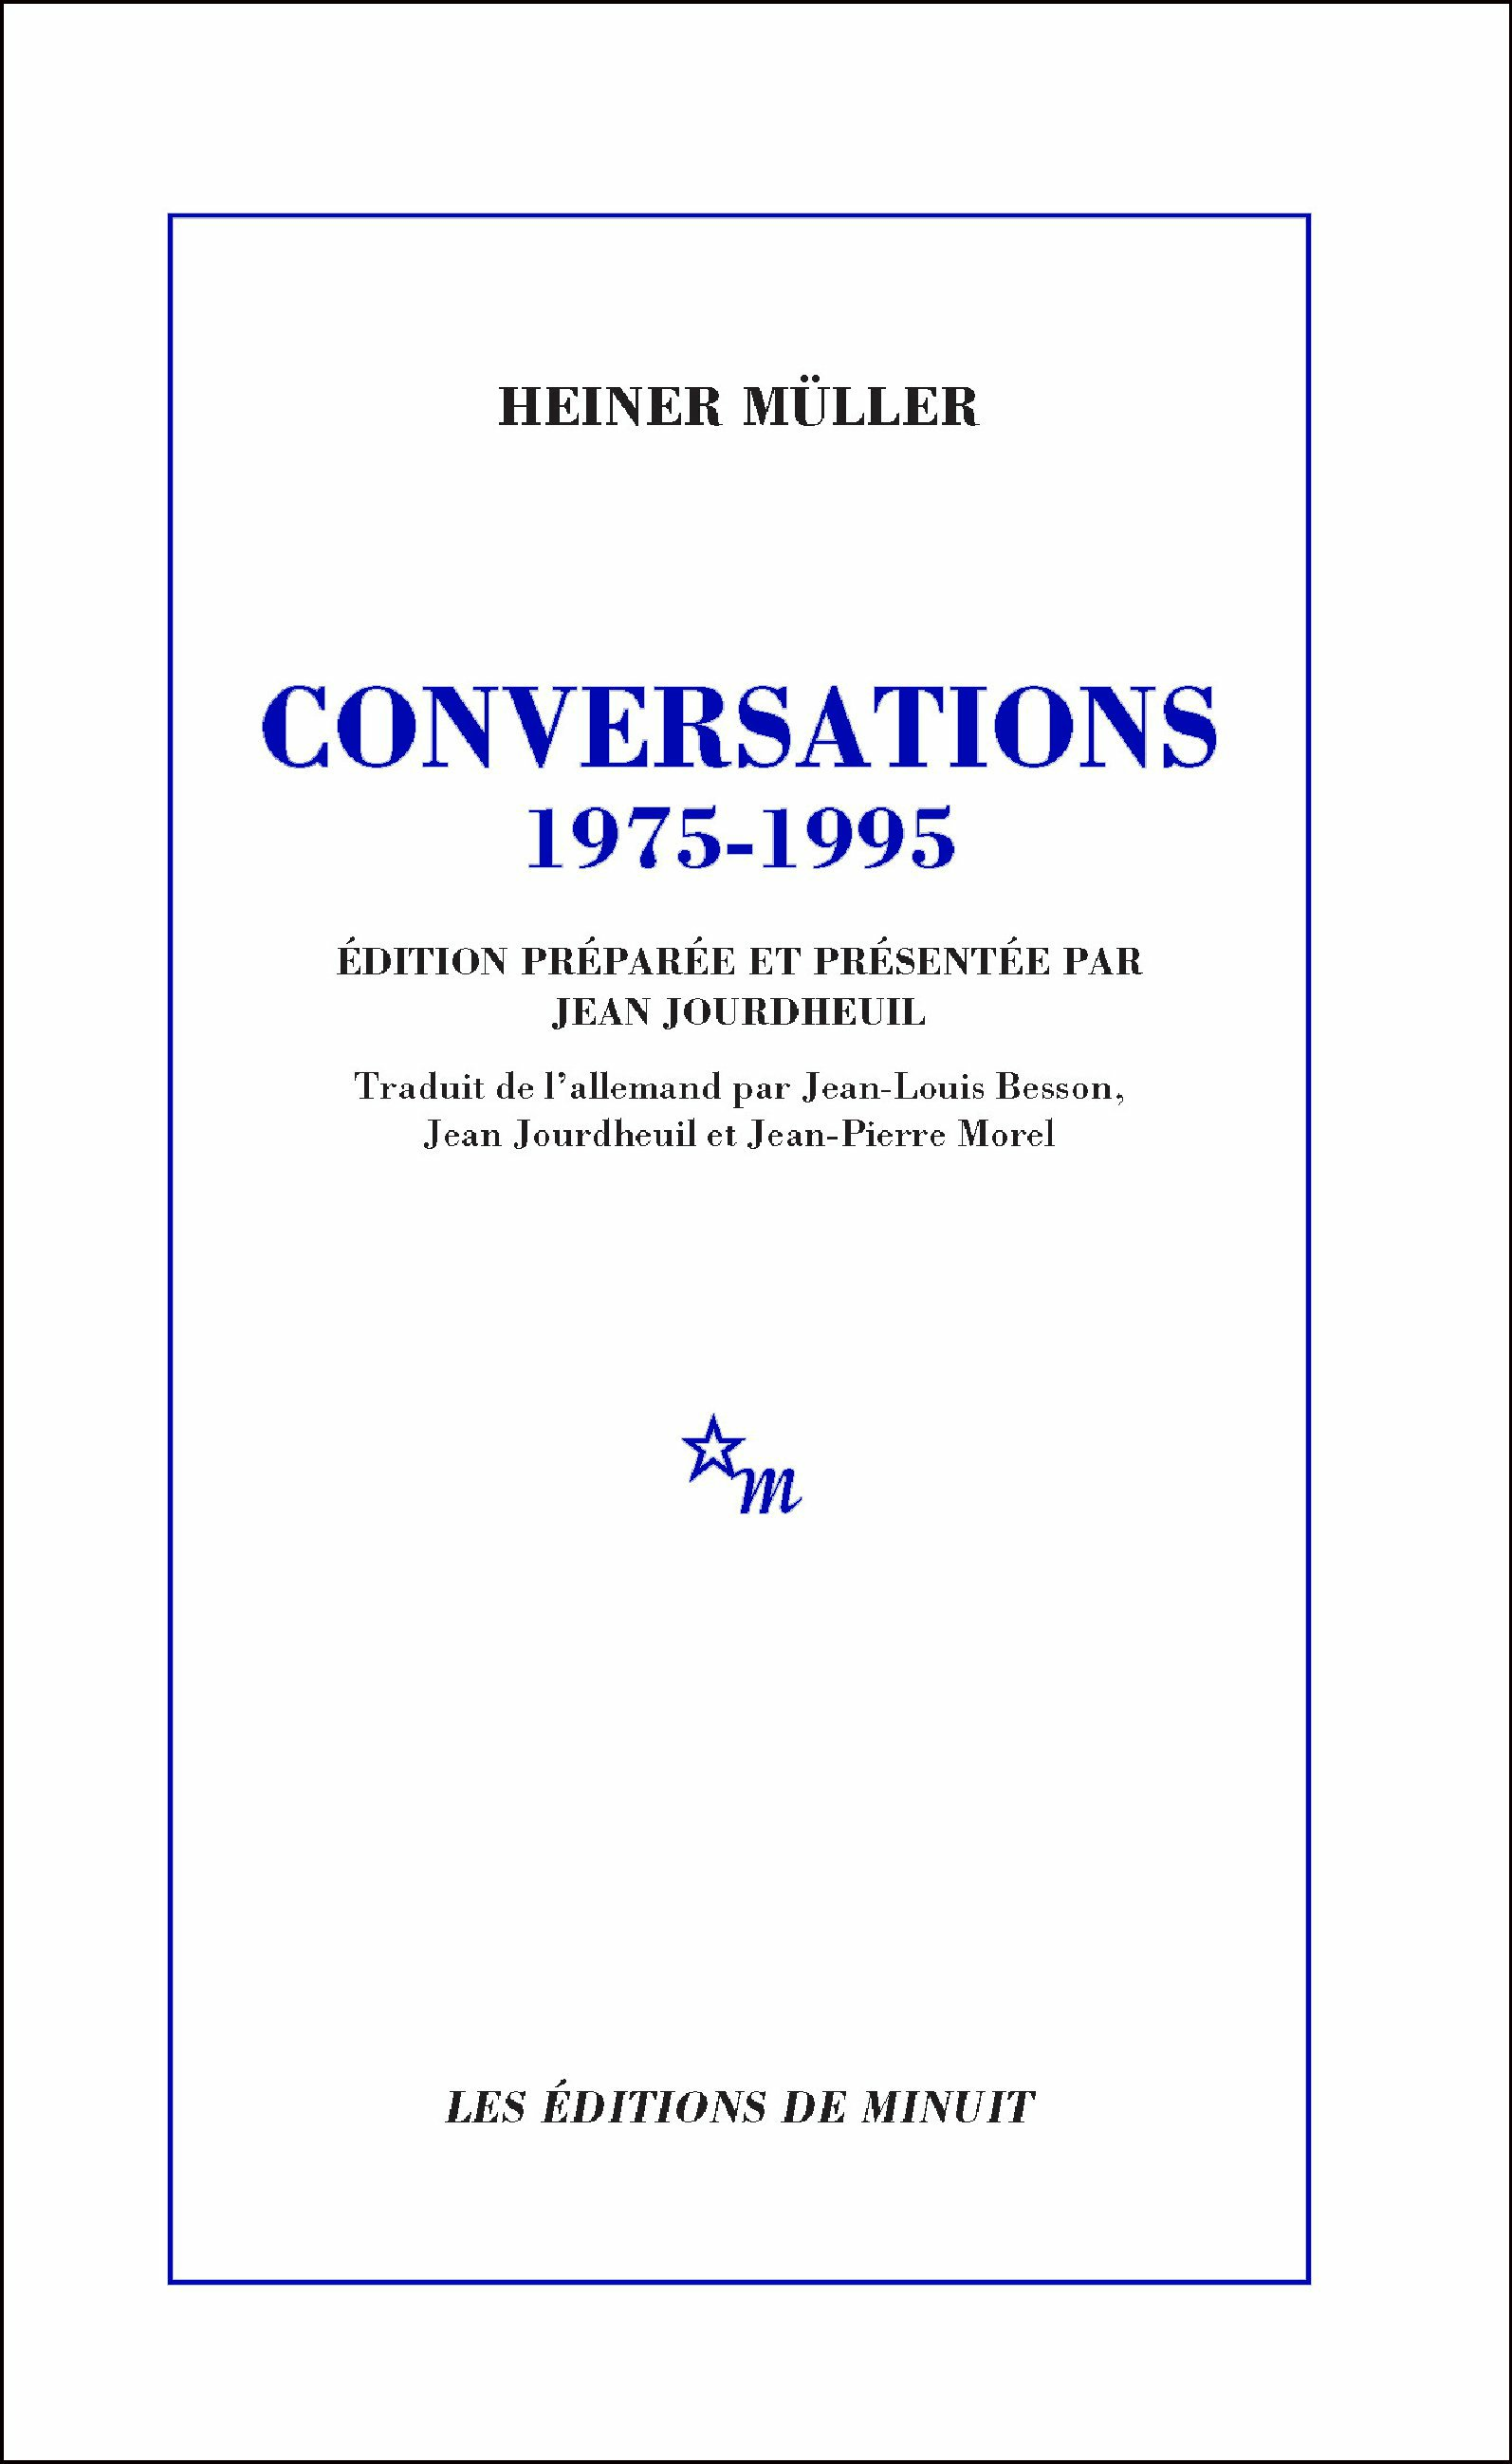 Conversations, 1975-1995